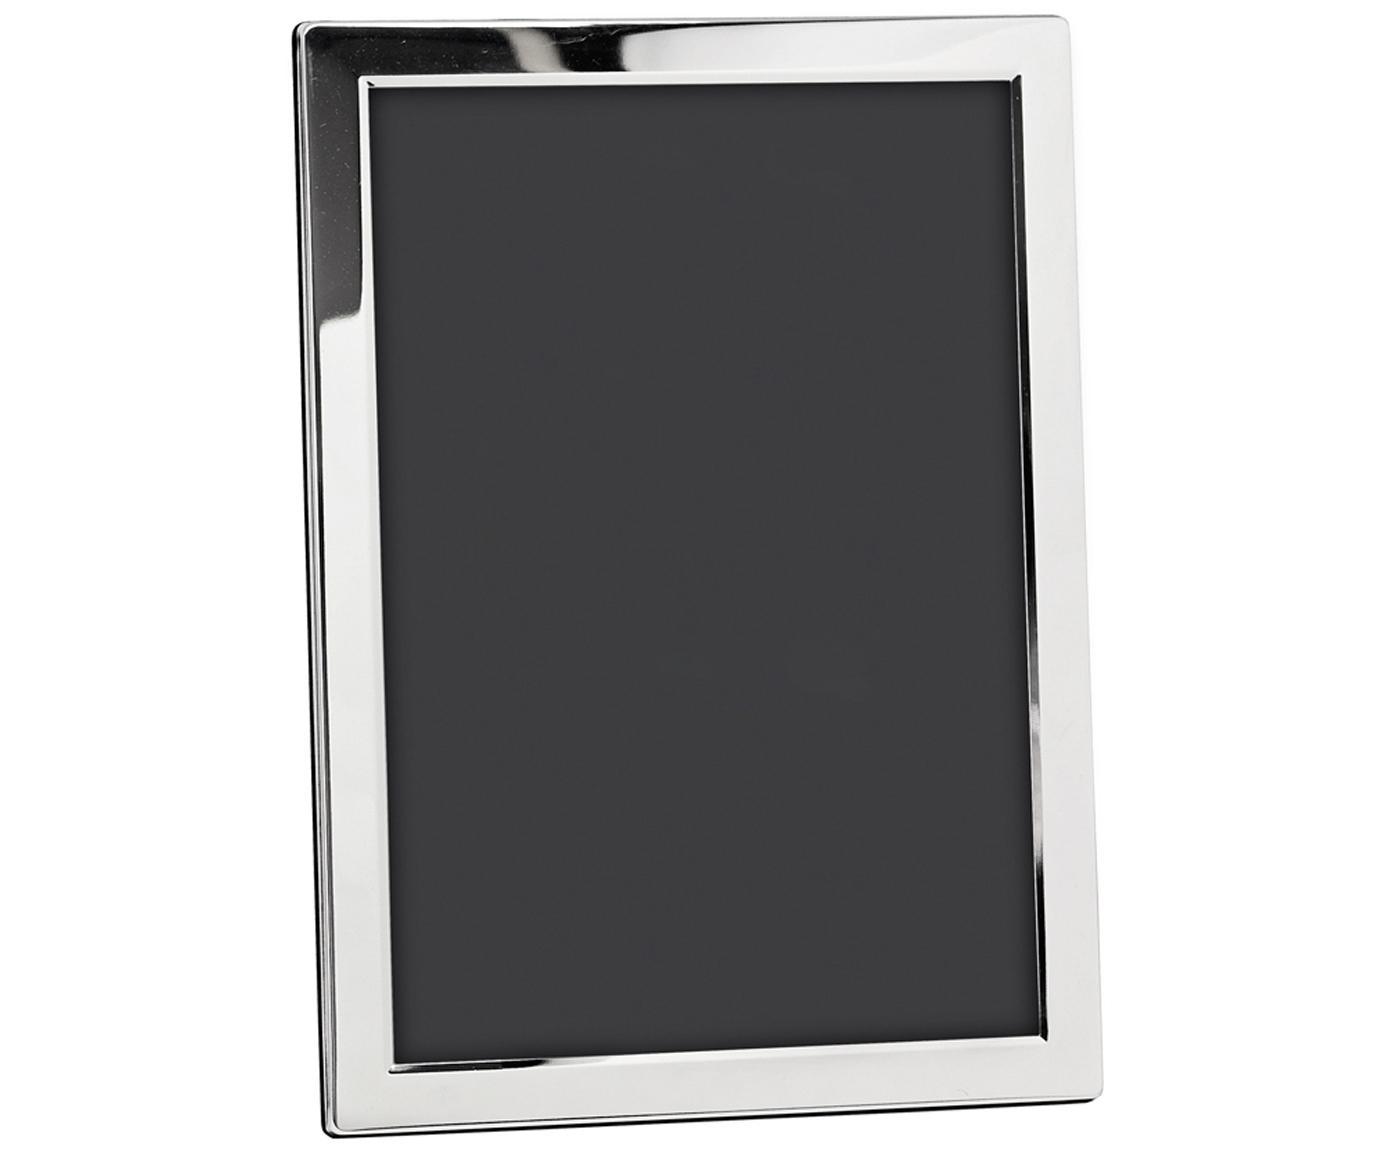 Cornici Carrara, Cornice: acciaio, argento placcato, Cornice: argento Frontale: trasparente, 20 x 30 cm